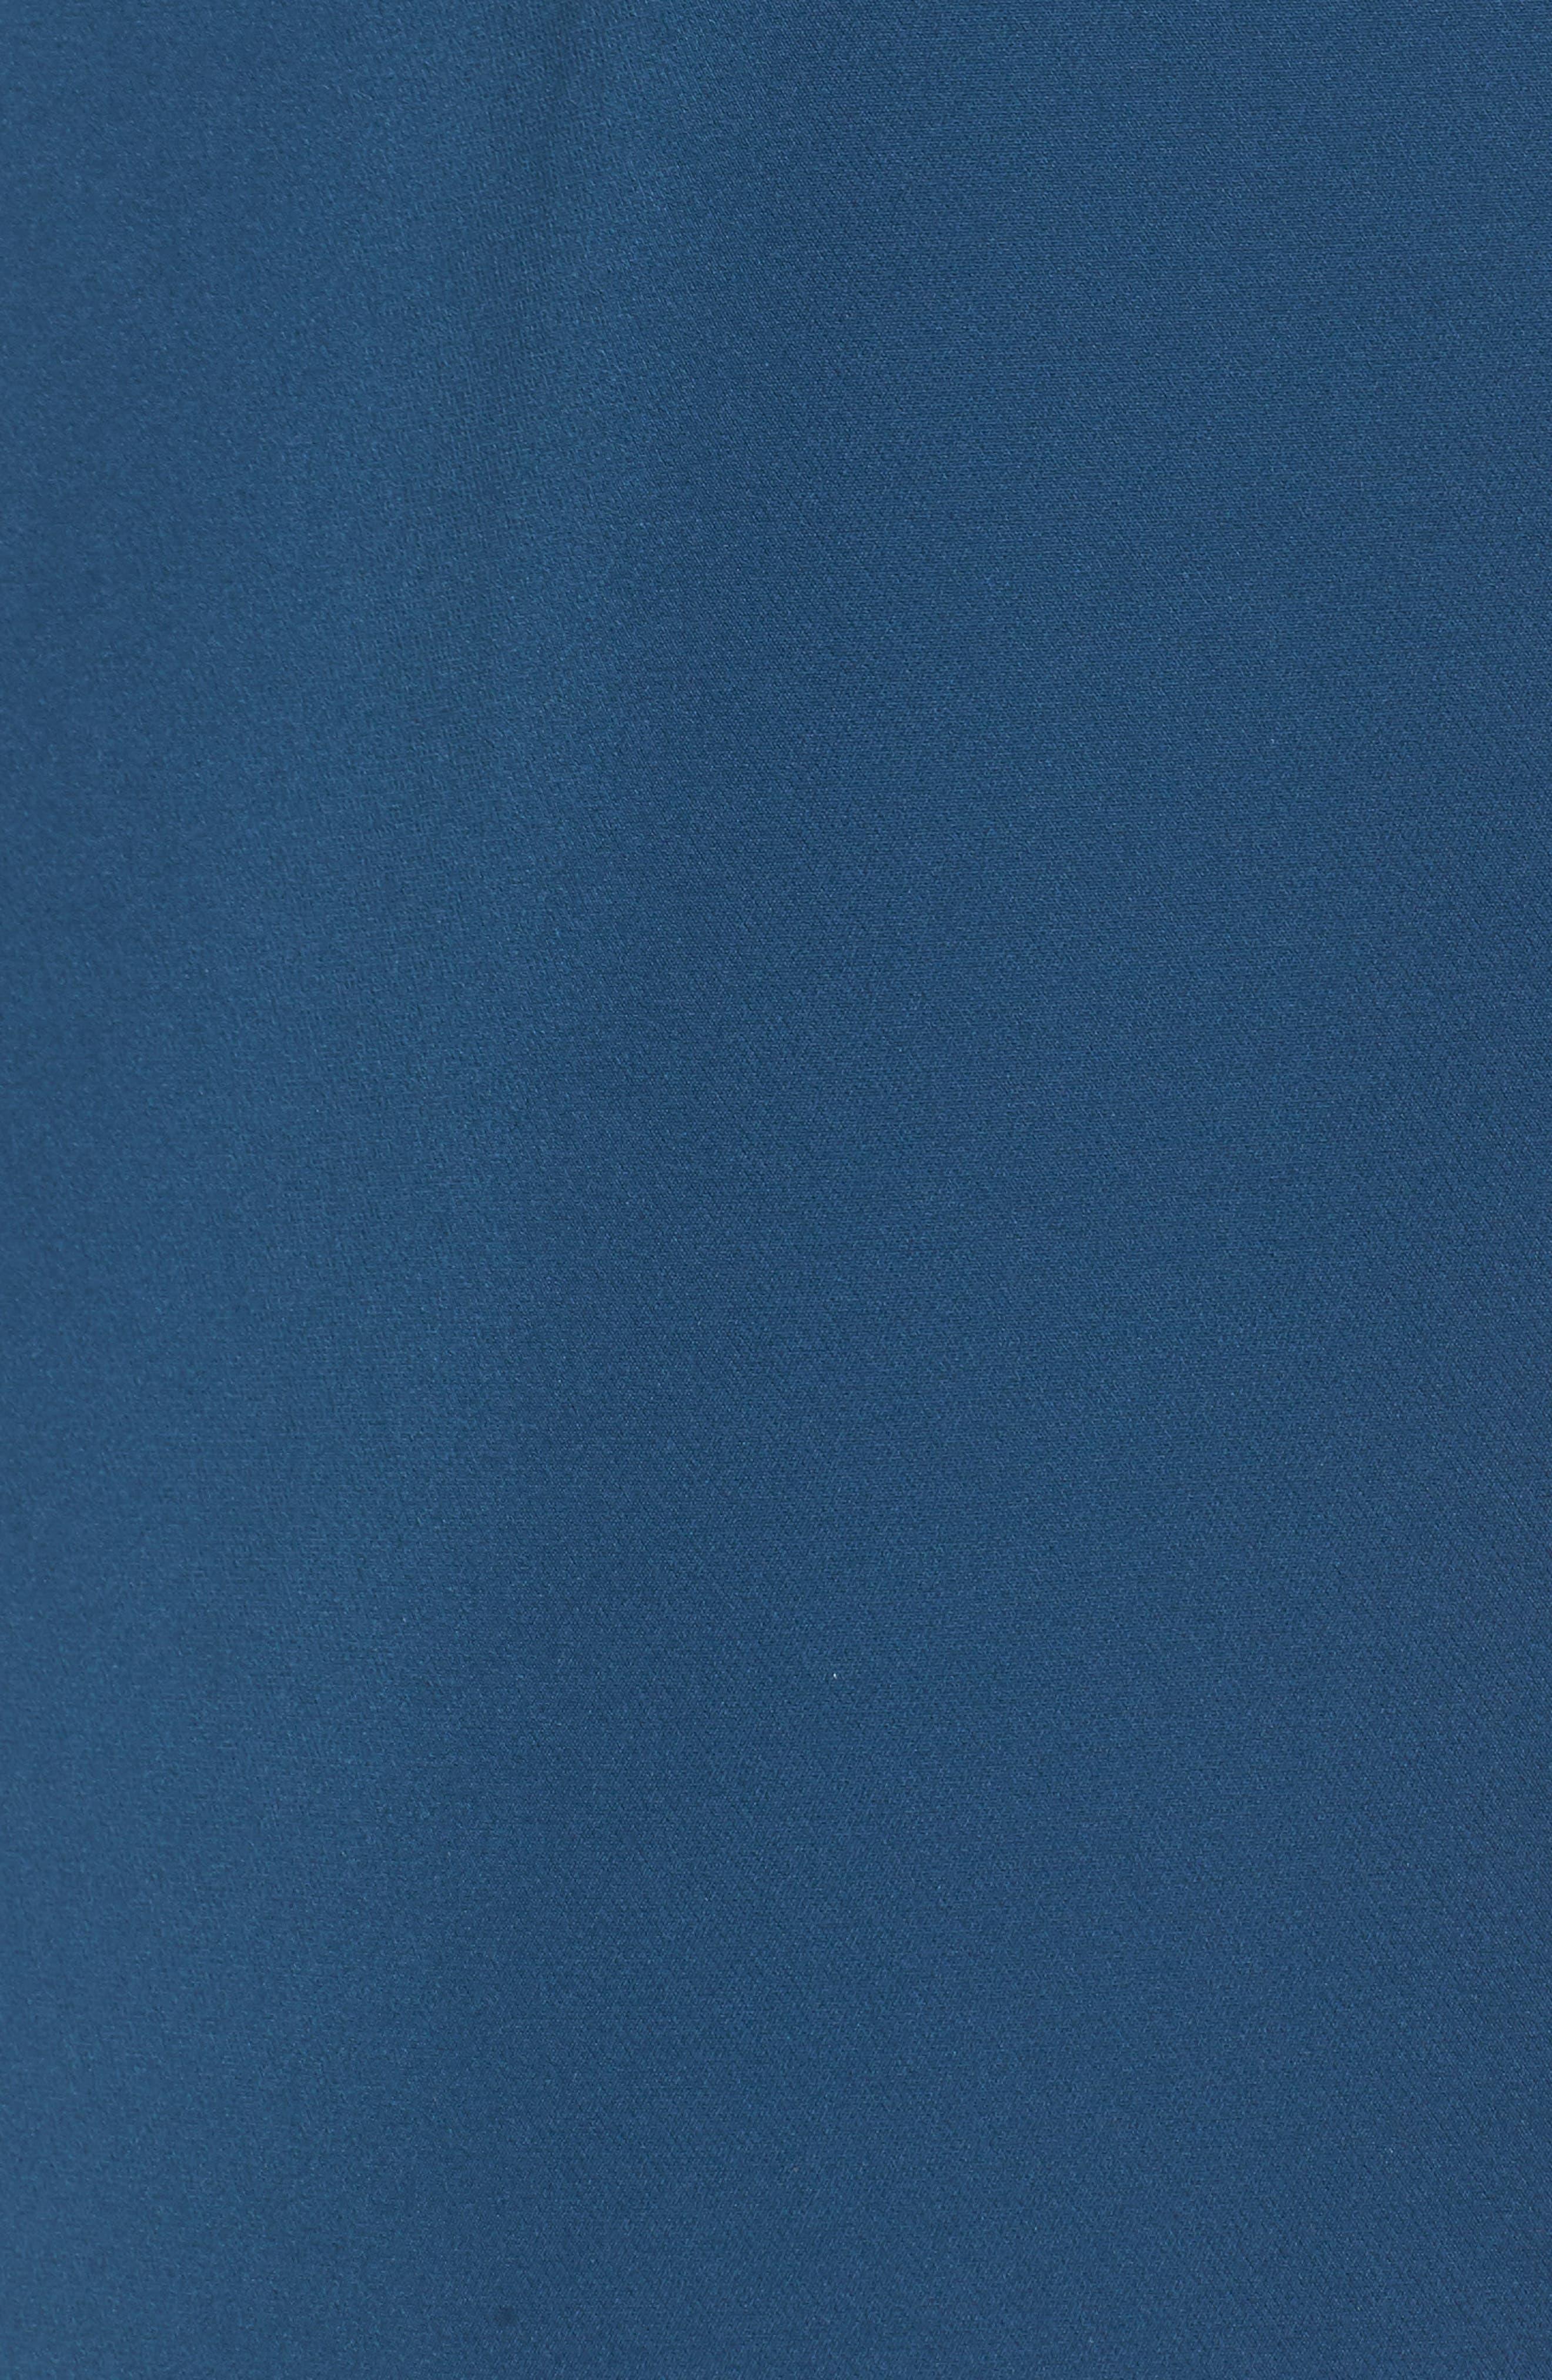 Ruffle Crepe A-Line Dress,                             Alternate thumbnail 6, color,                             Deep Teal